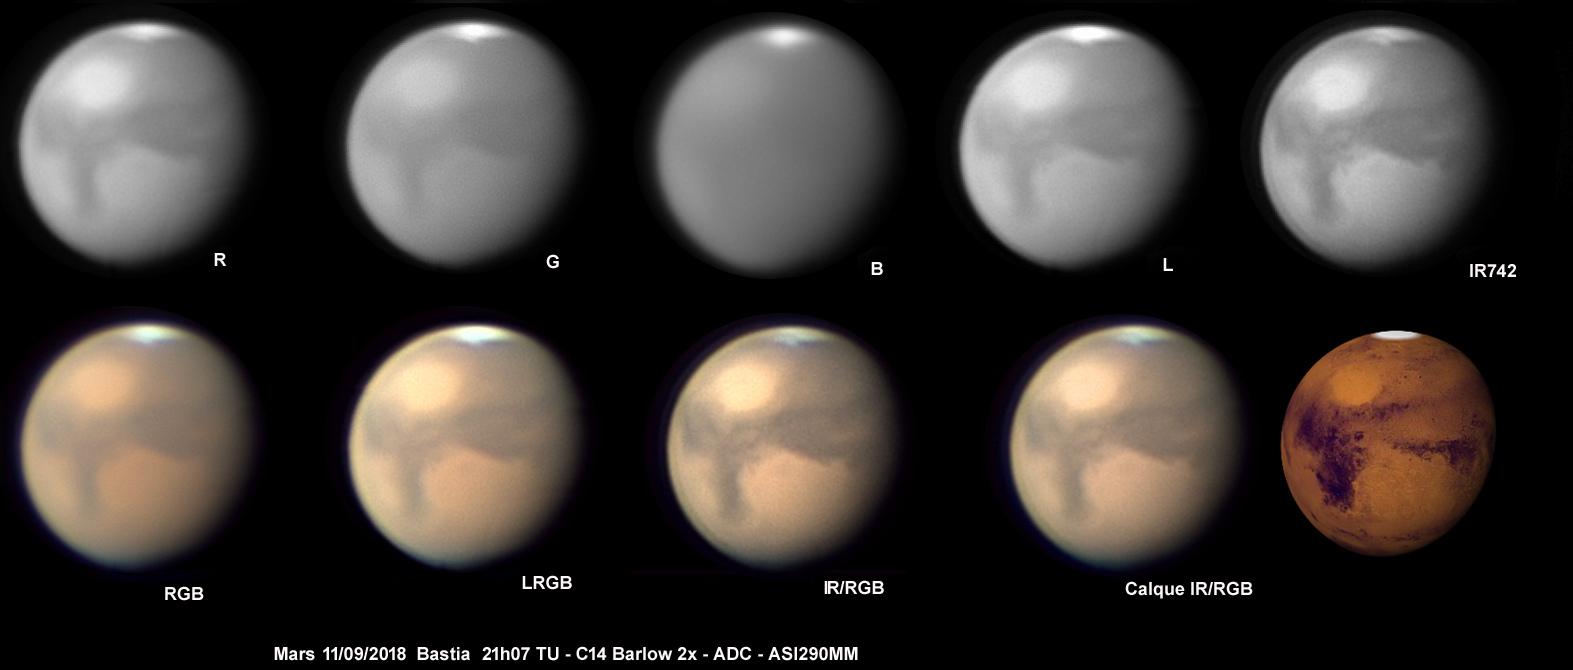 Mars-11-09-2018-planche1.jpg